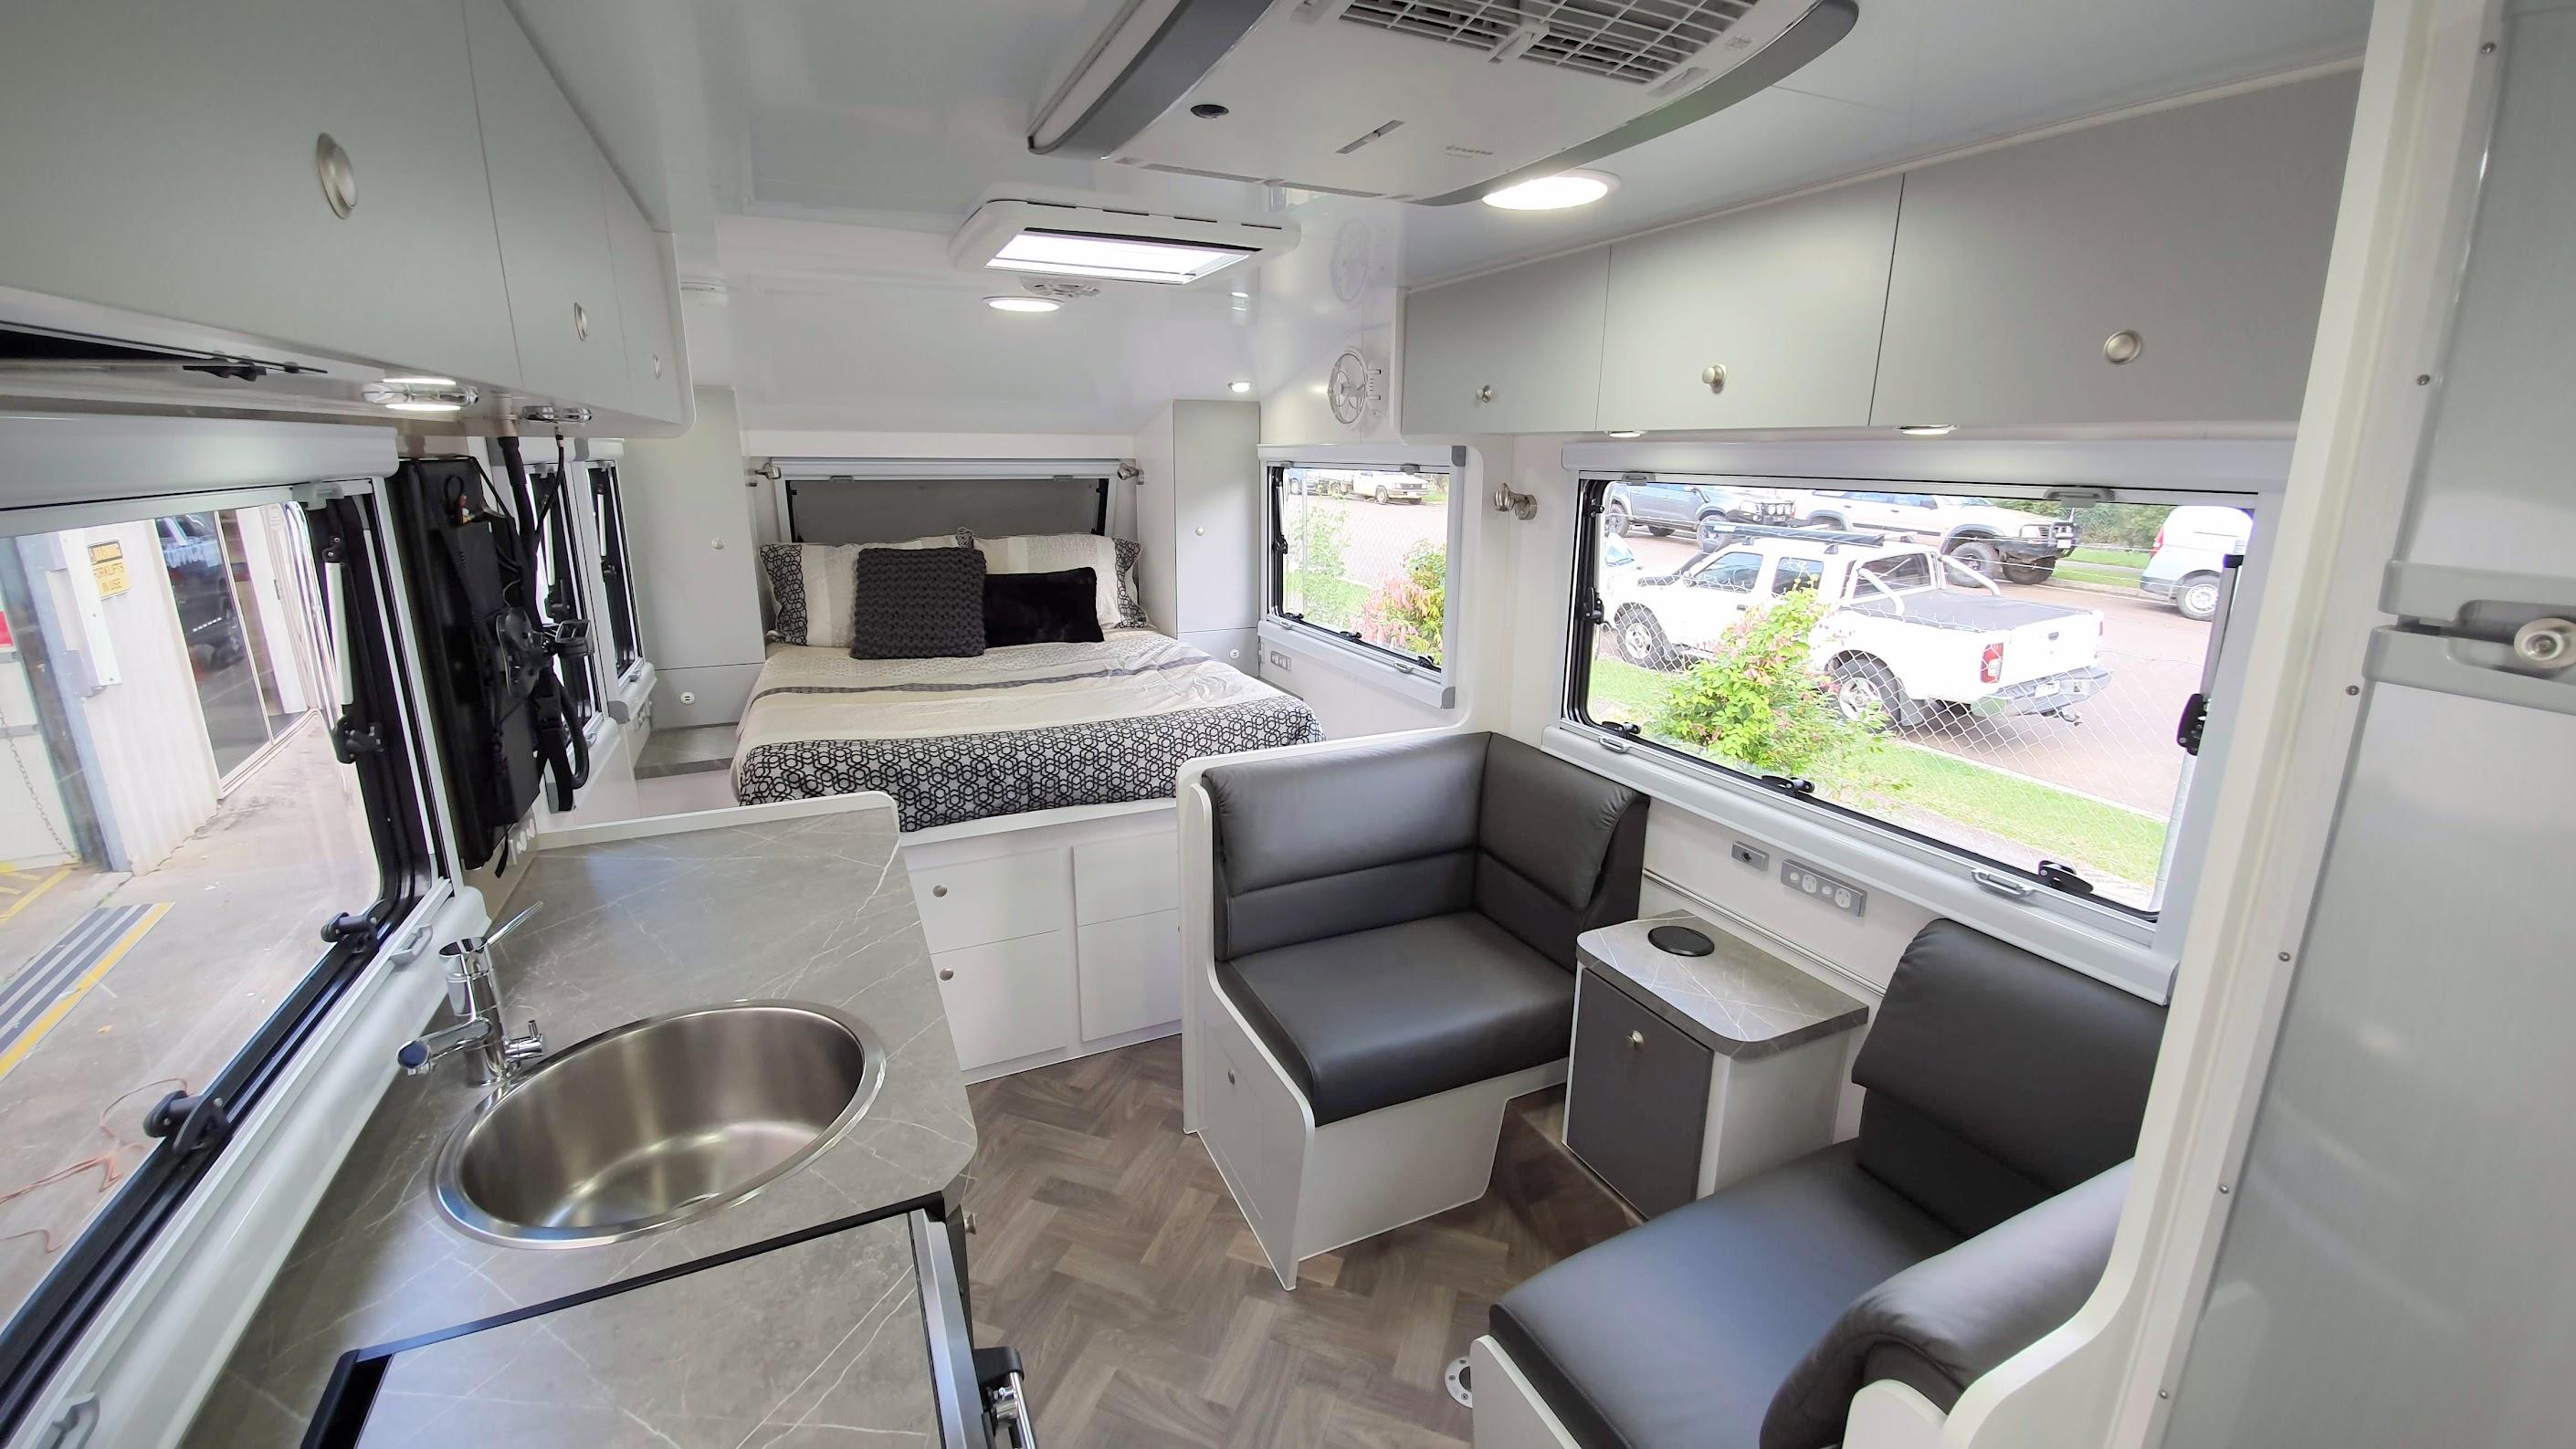 18-Foot Caravans for Sale